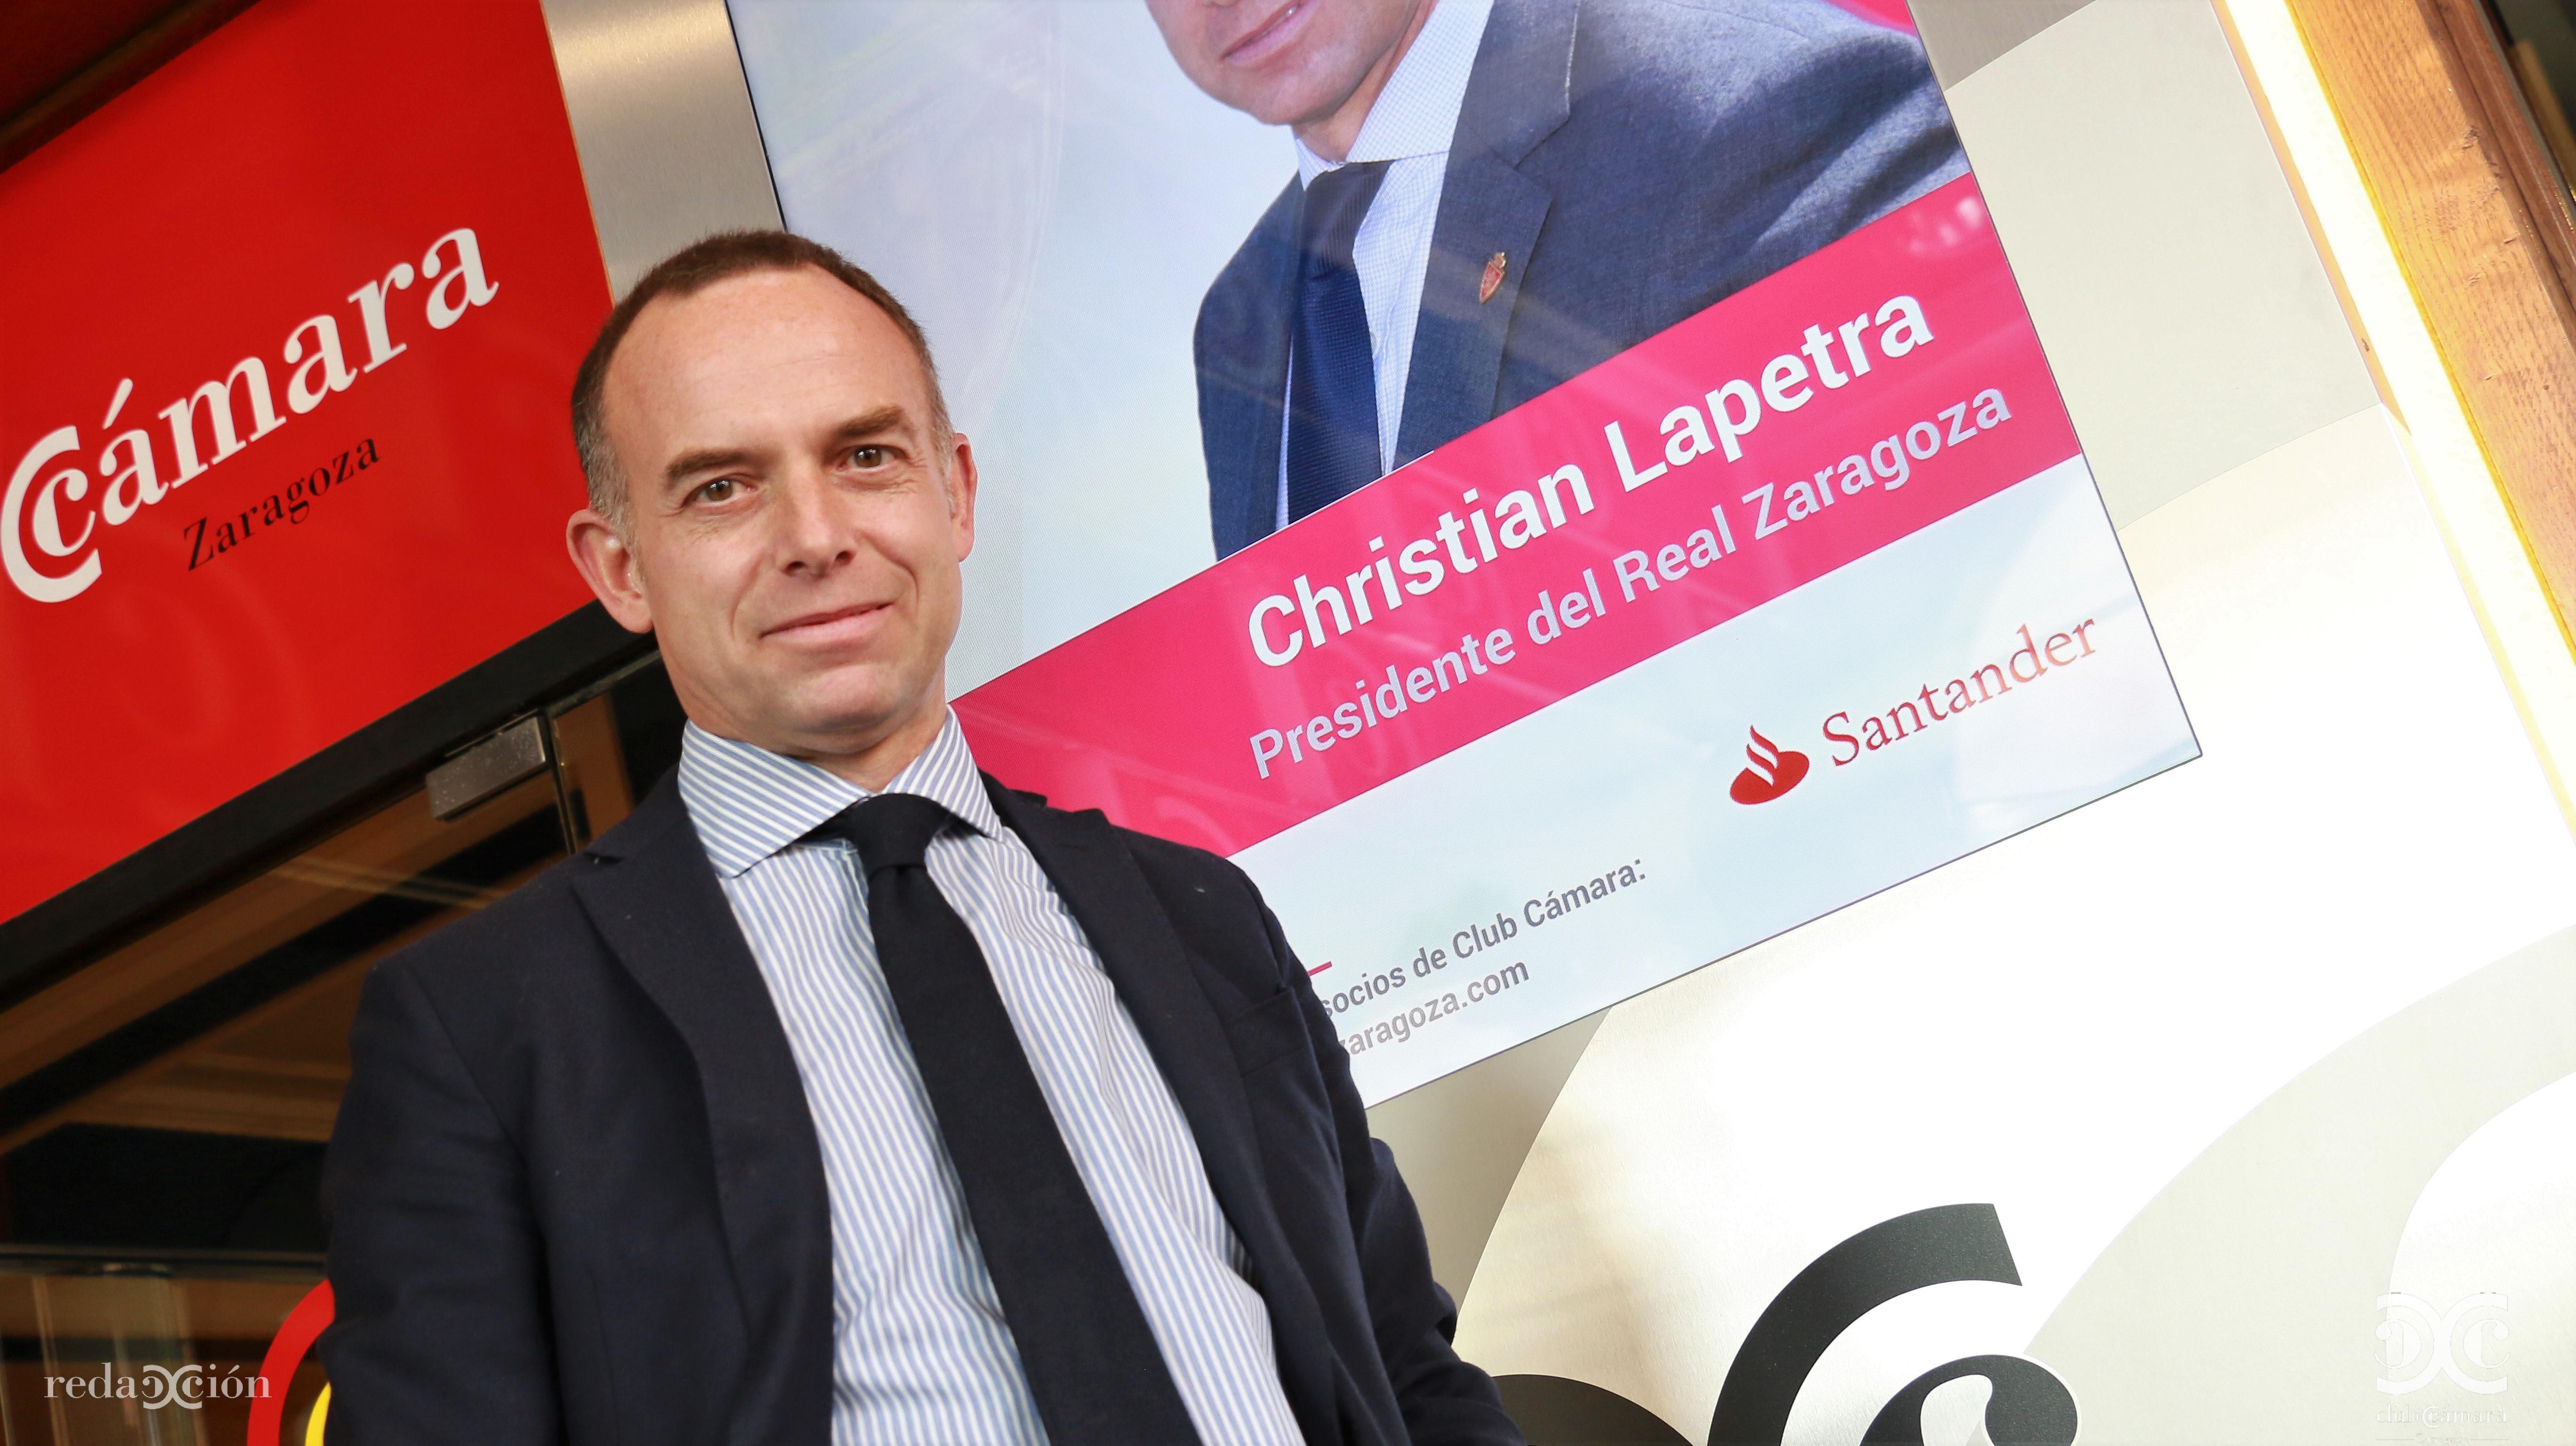 Christian Lapetra